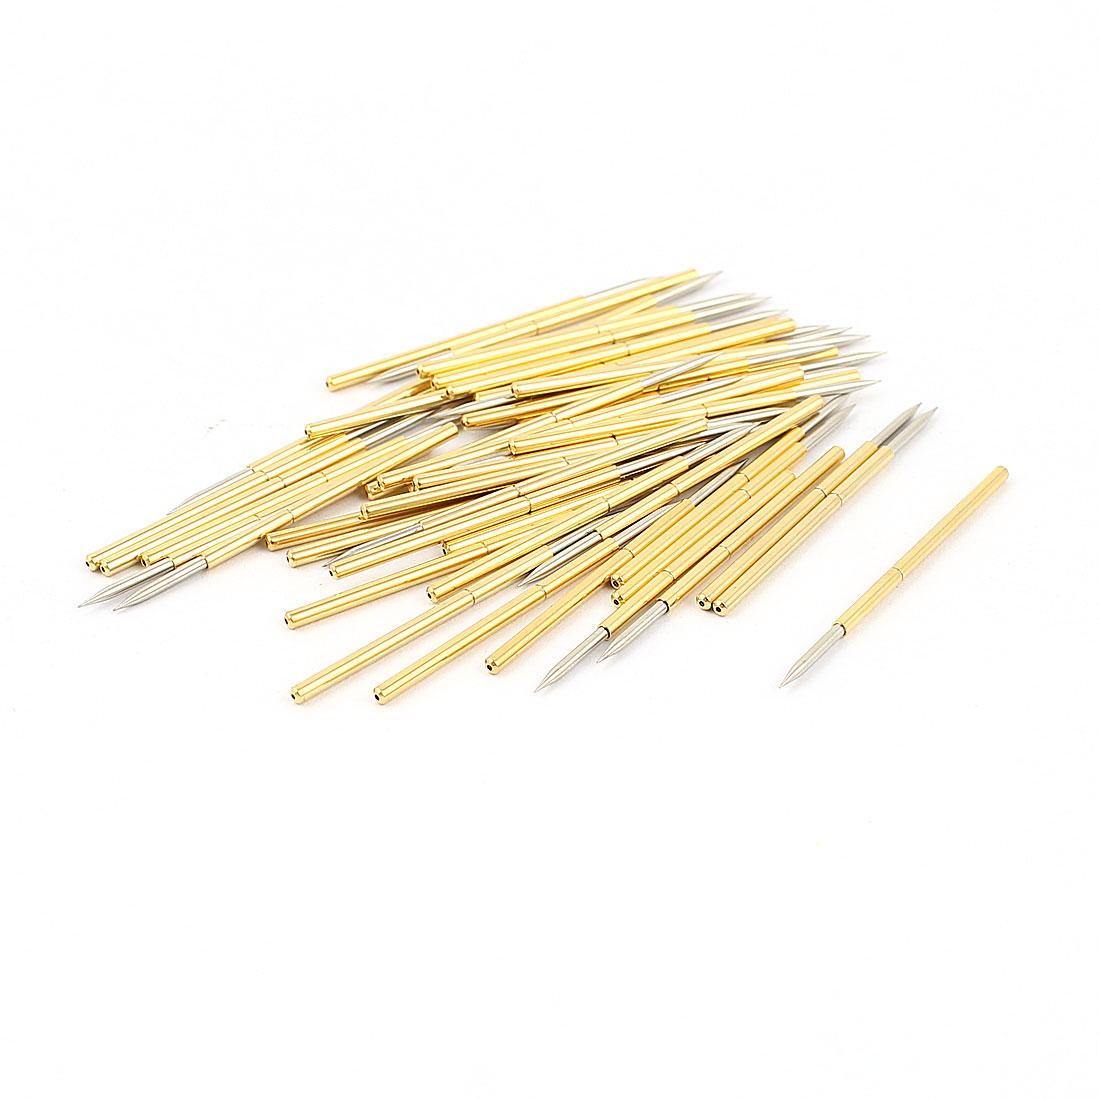 50 Pcs P100-B1 1.0mm Spear Tip Spring Testing Probes Pin 32.3mm Length